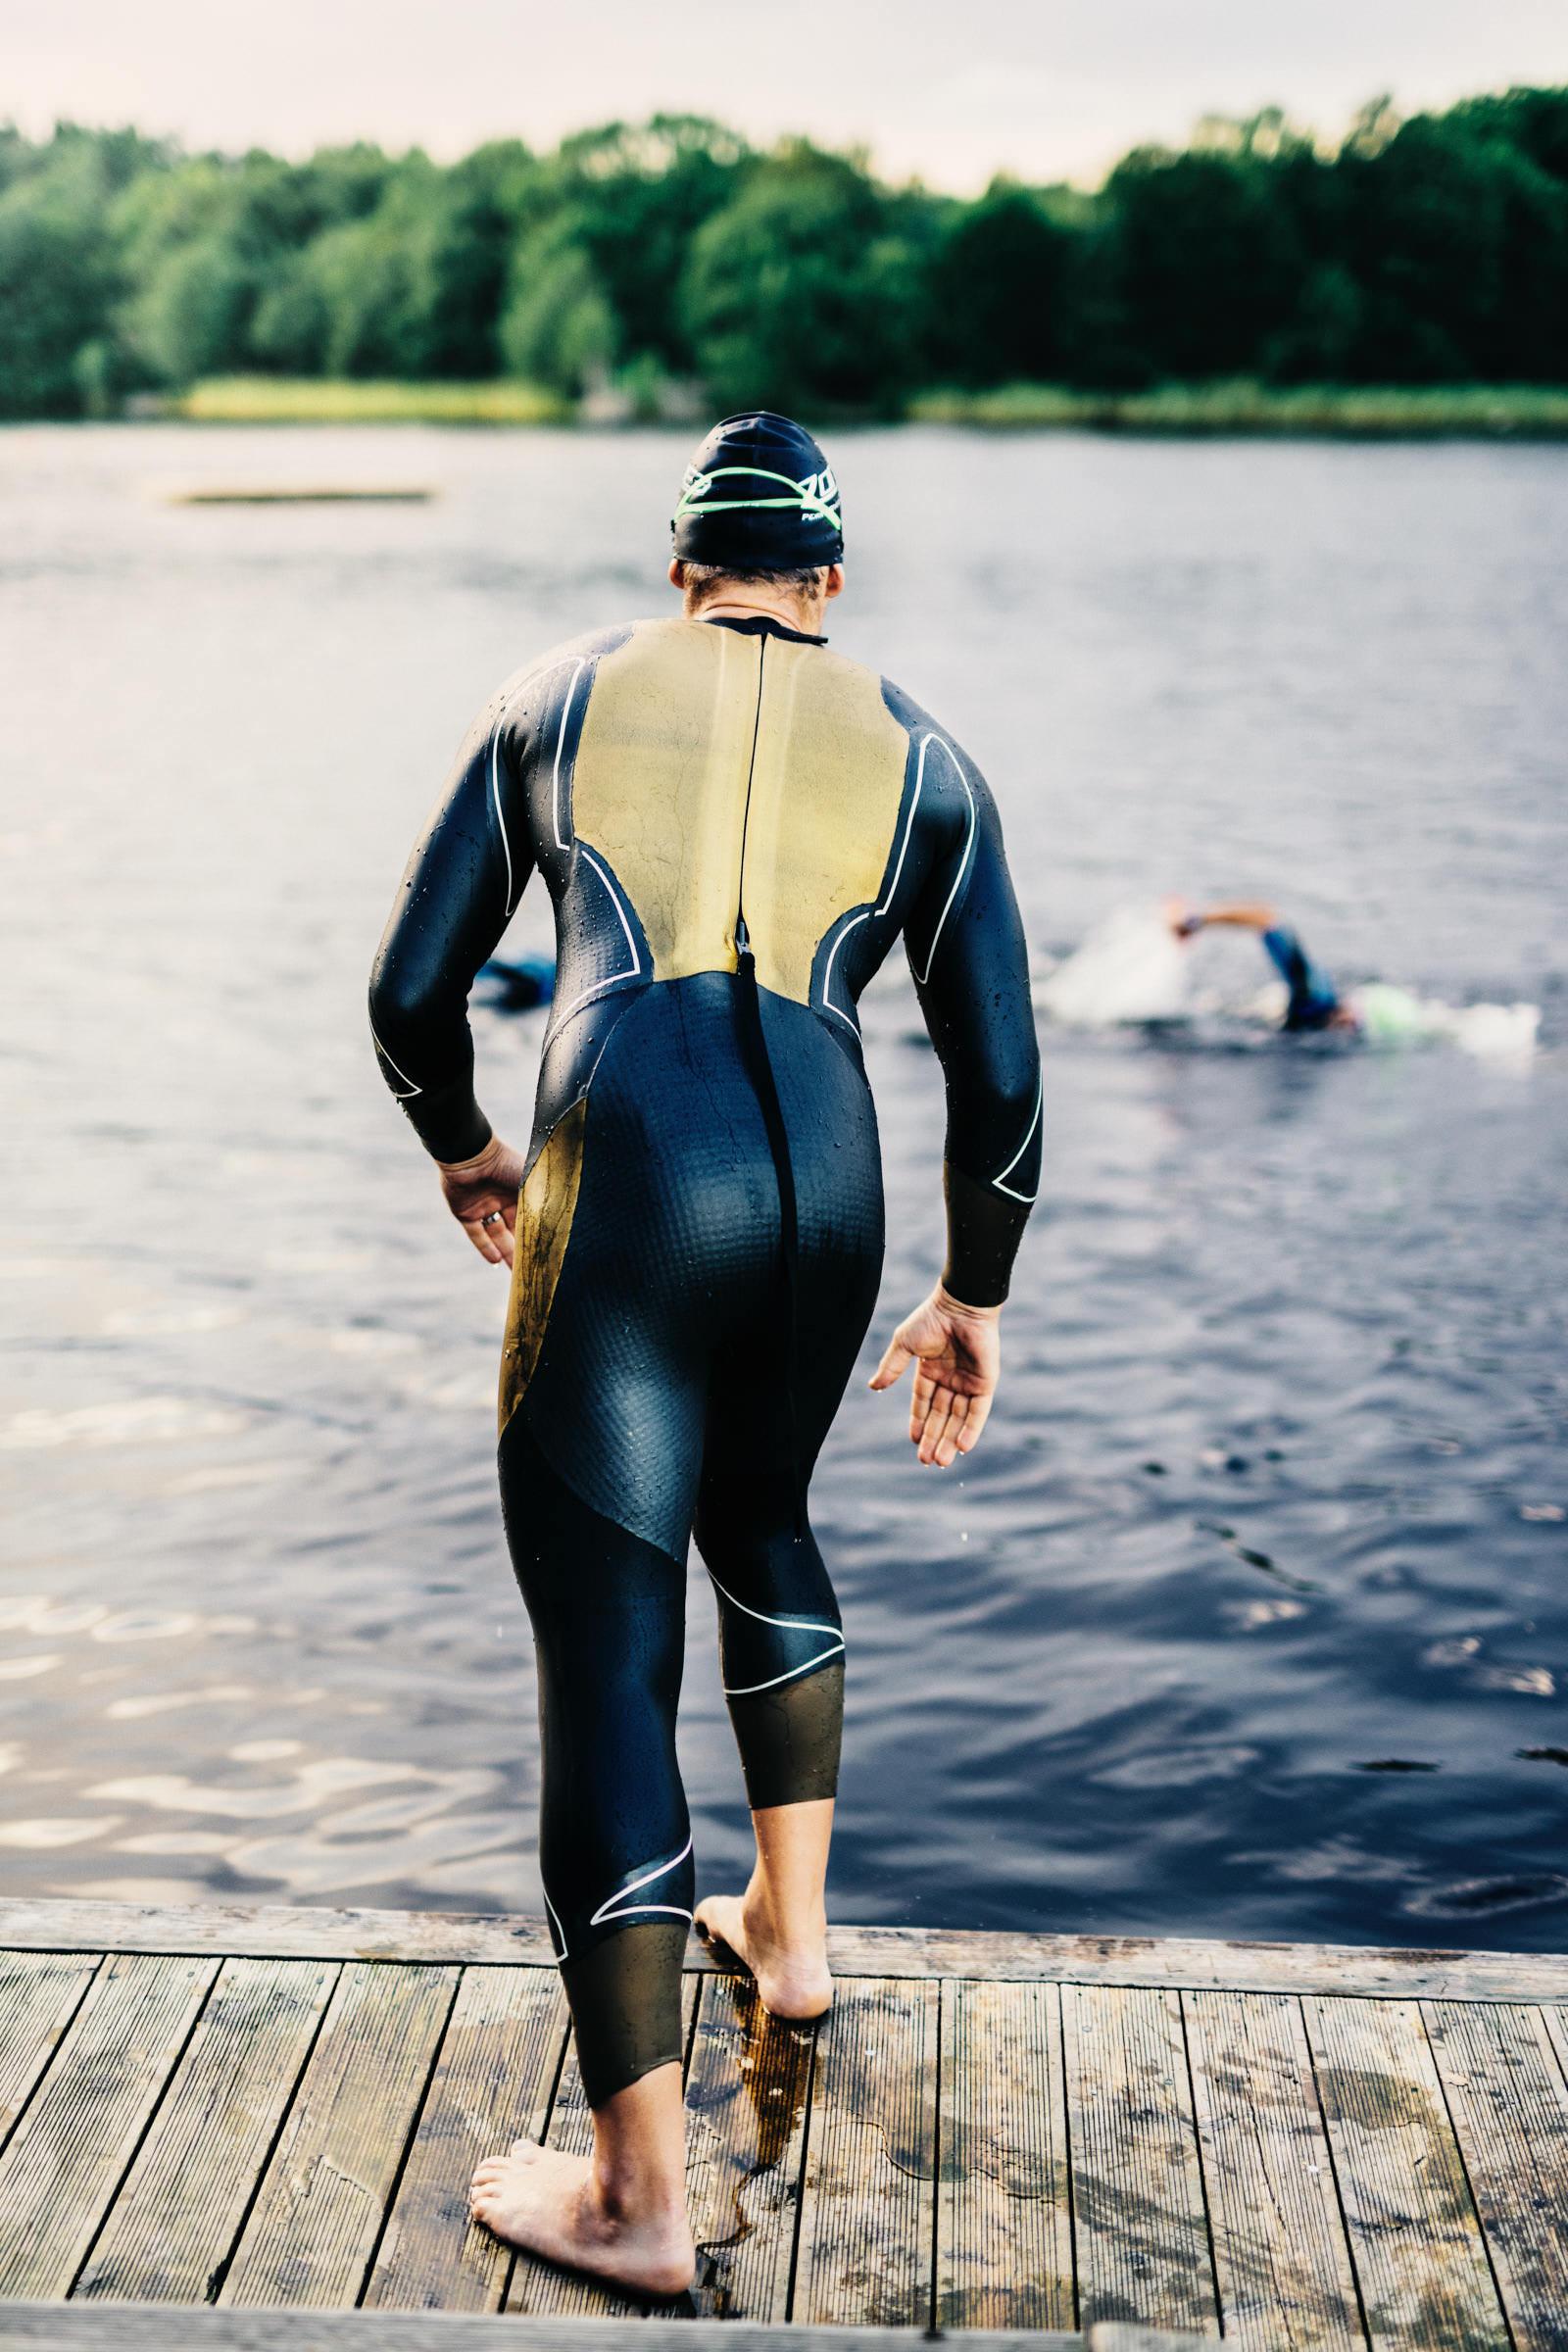 Portfolio_390_BMW_Triathlon_Dan_DSC1619__KRISTOFER SAMUELSSON PHOTOGRAPHY.jpg